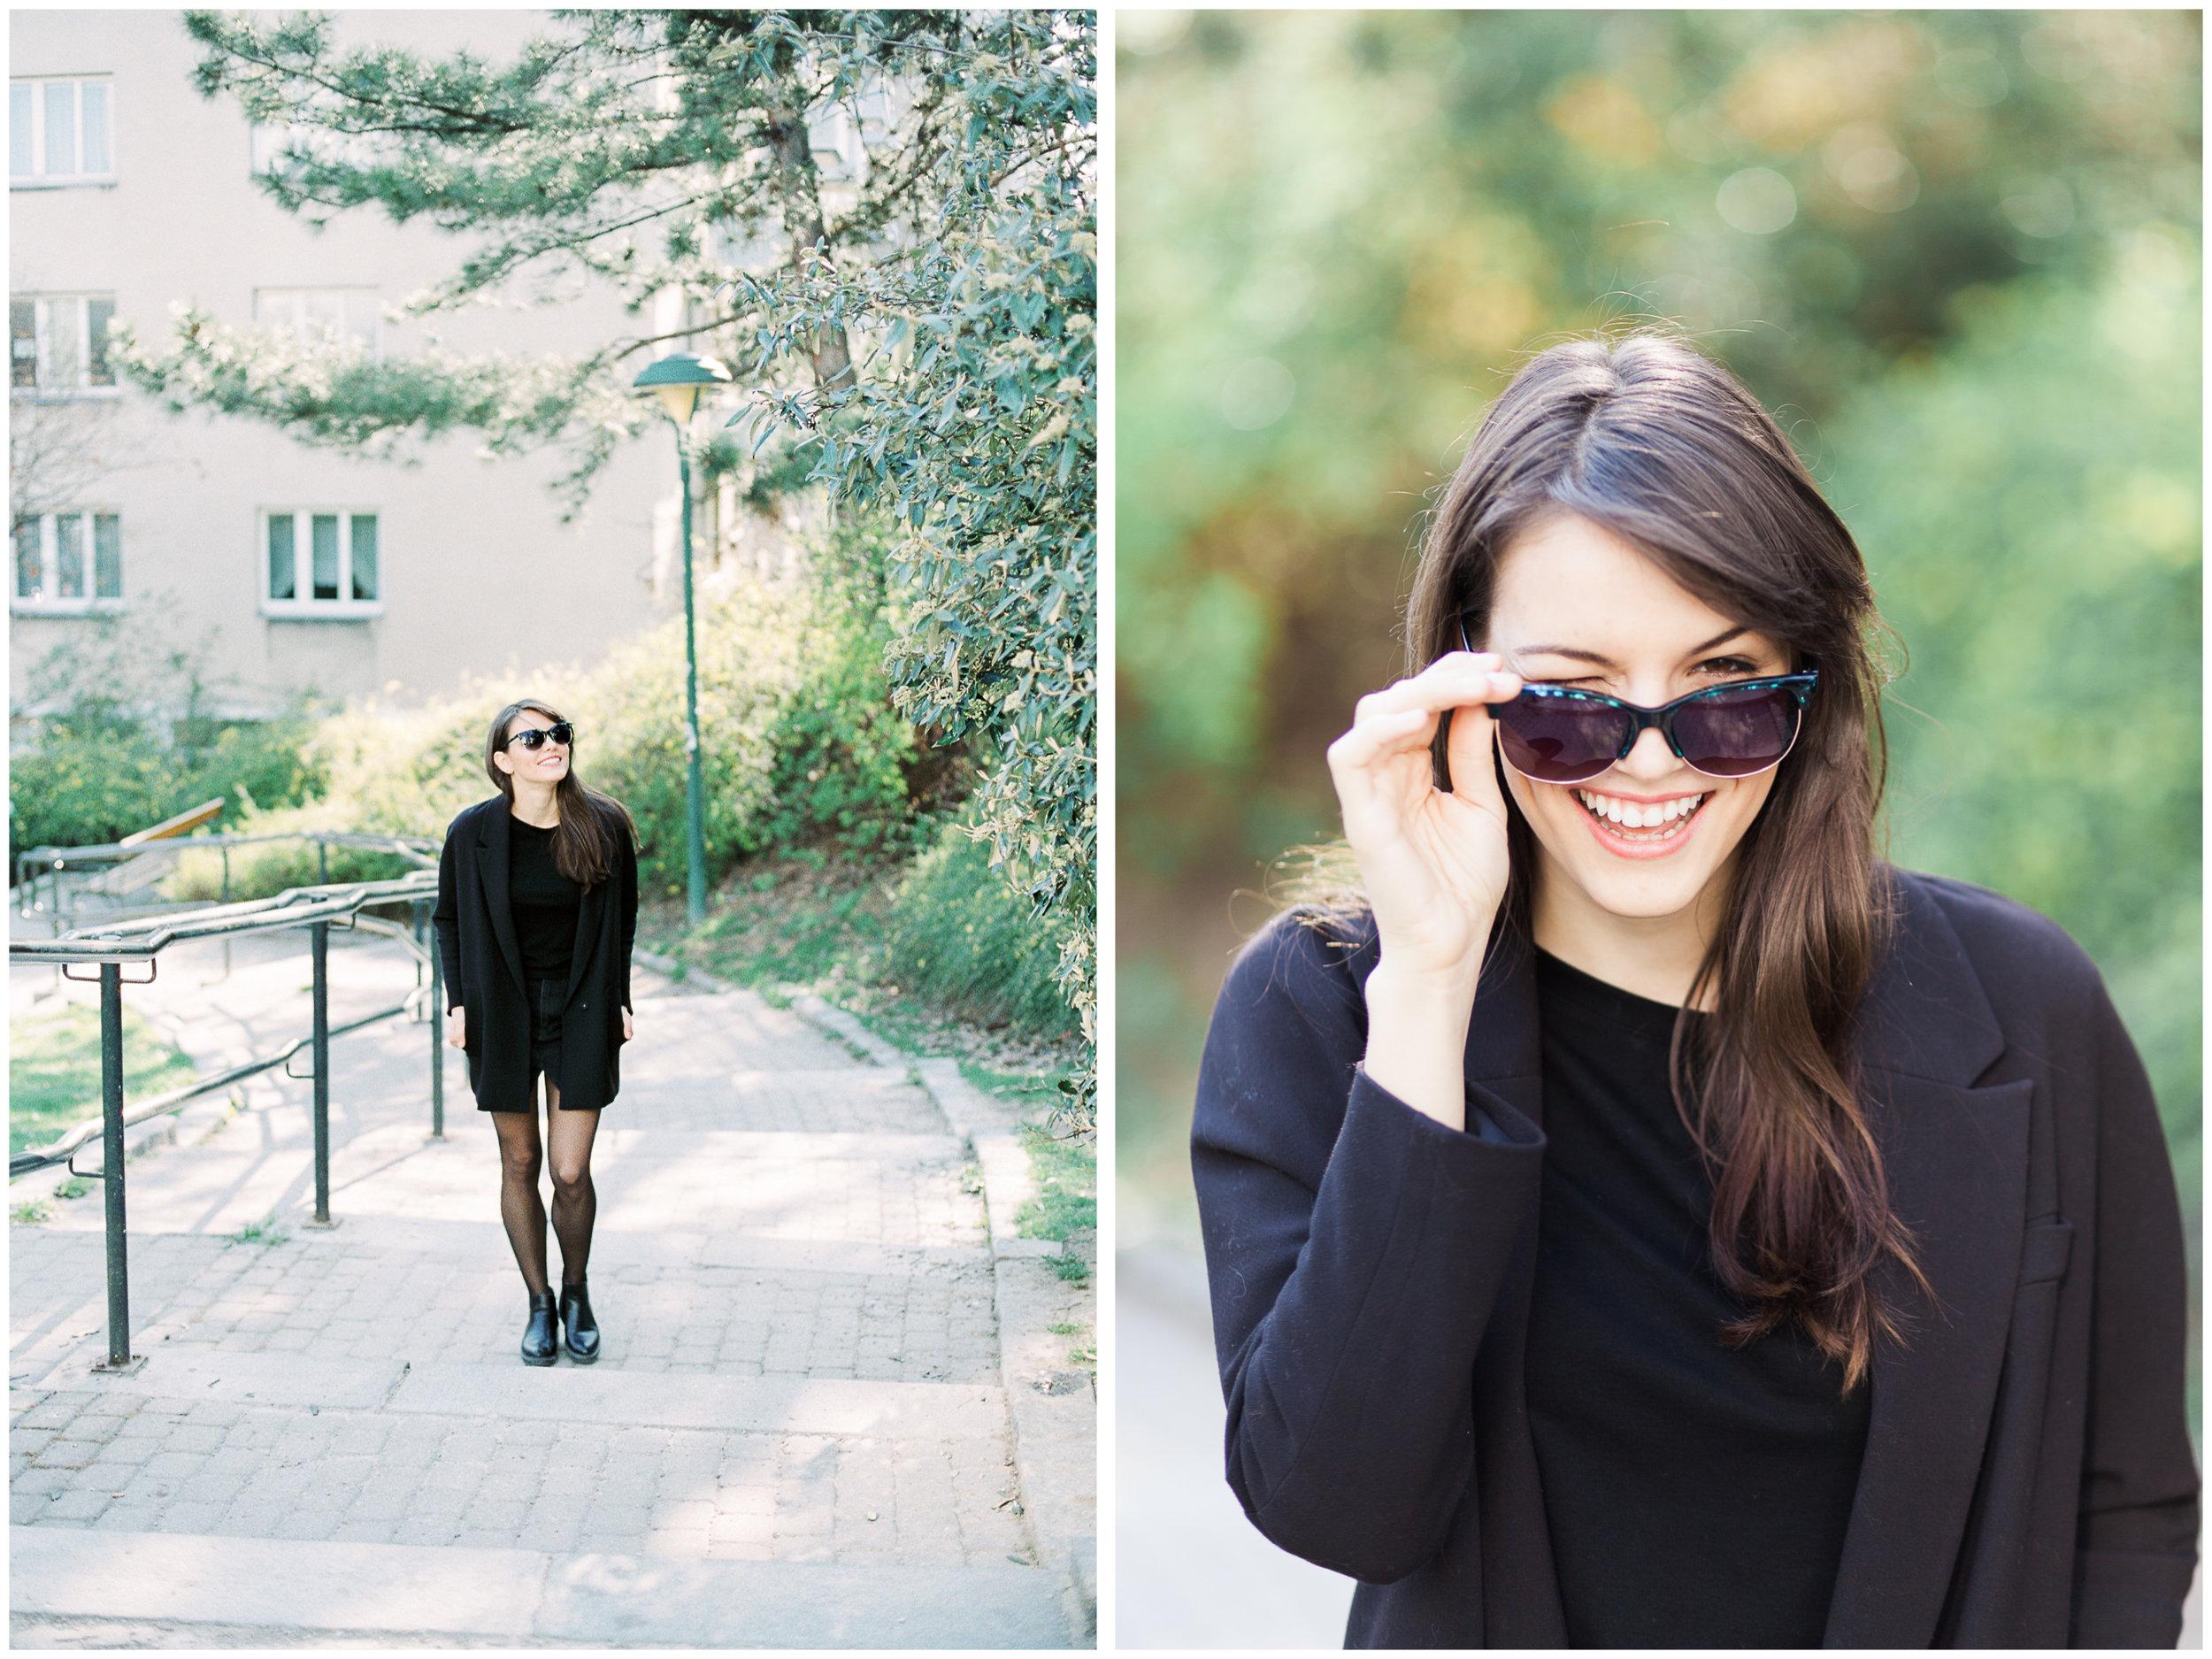 Michelle Mock Photography | Vienna, Austria | Female Portraits | Vienna Film Photographer